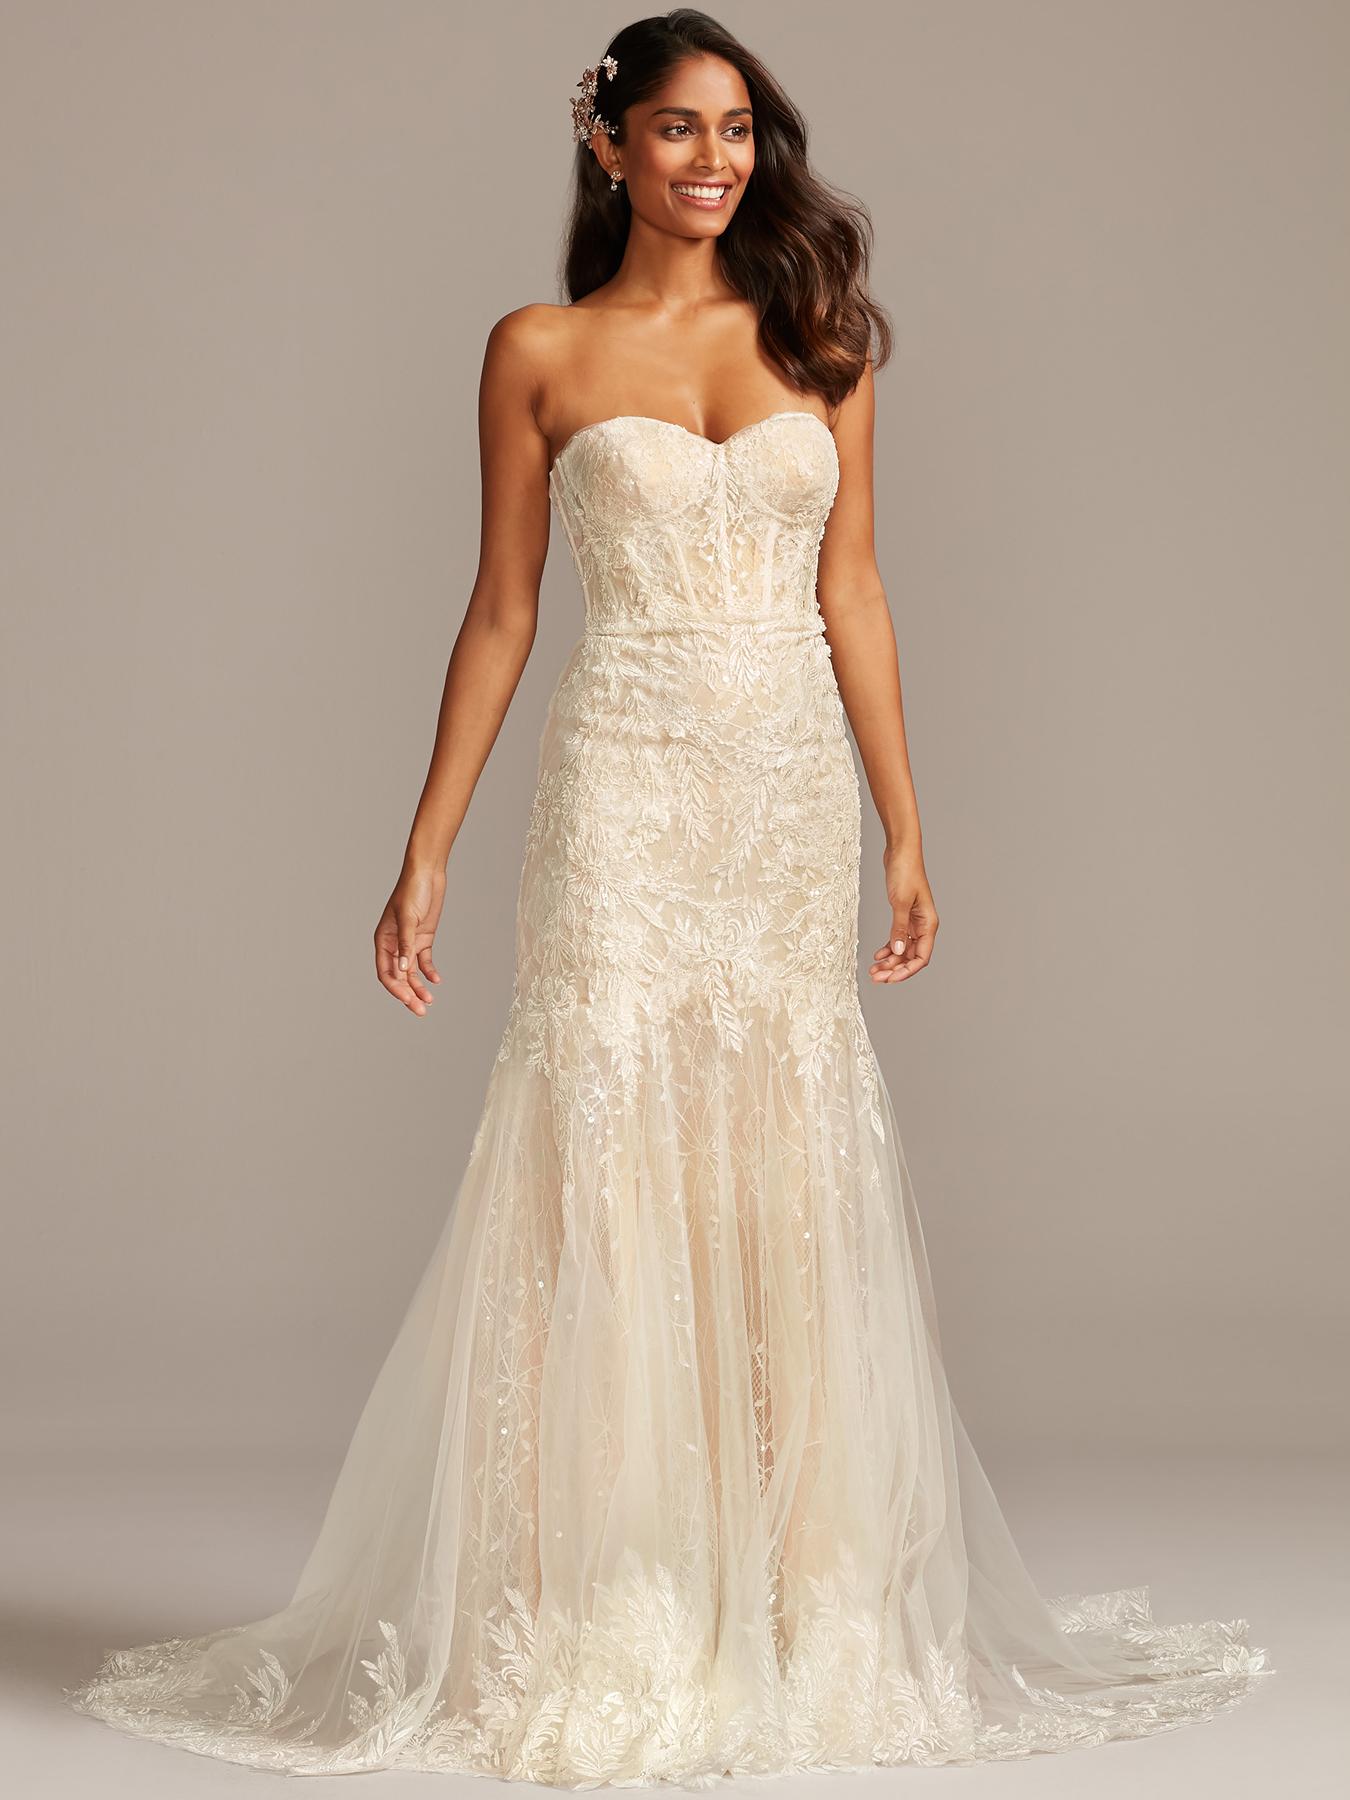 davids bridal melissa sweet strapless, boning lace wedding dress fall 2020